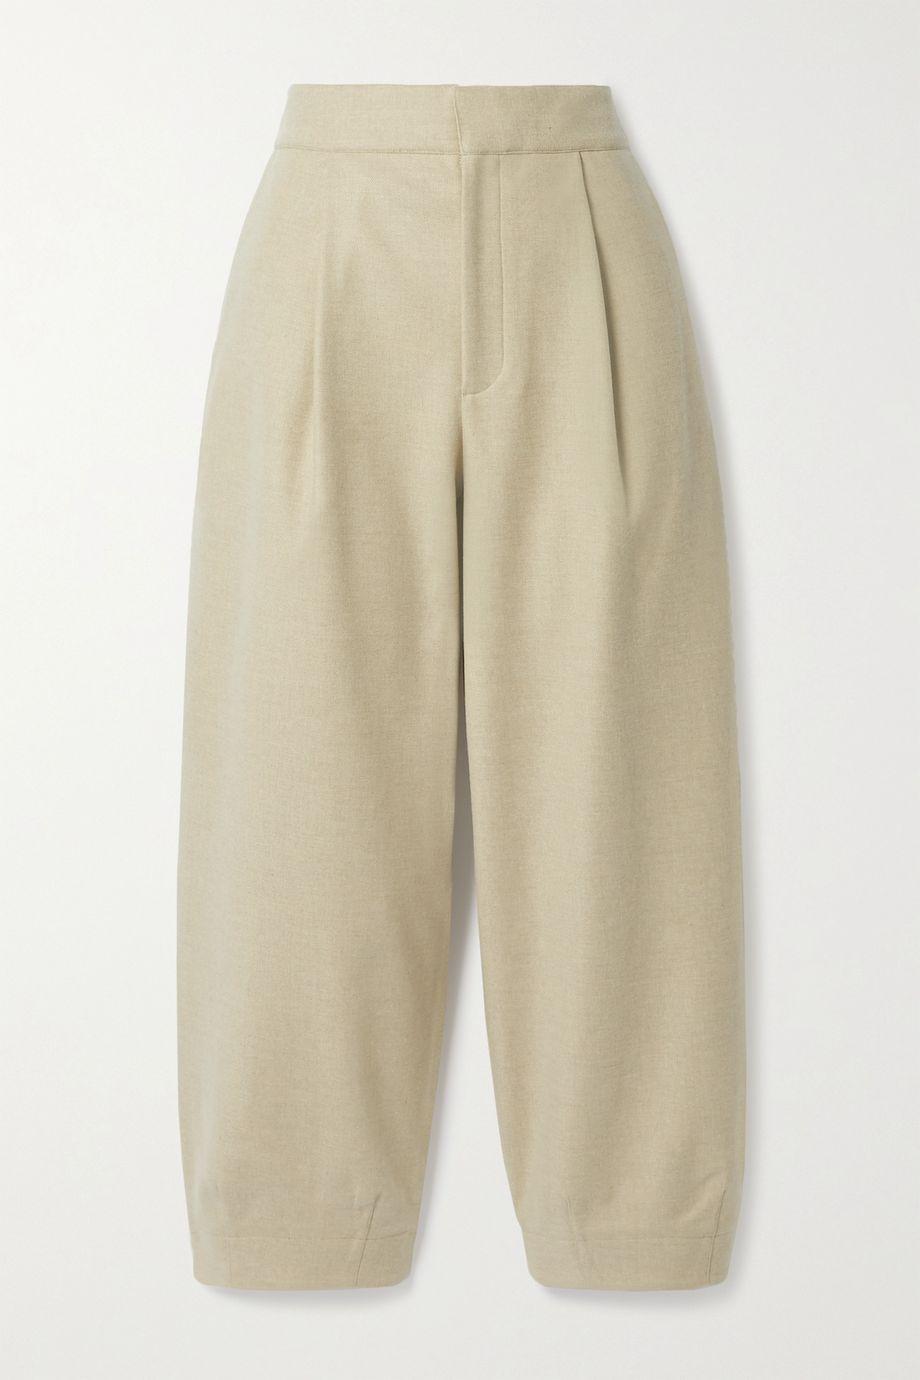 Tibi Stella flannel pants